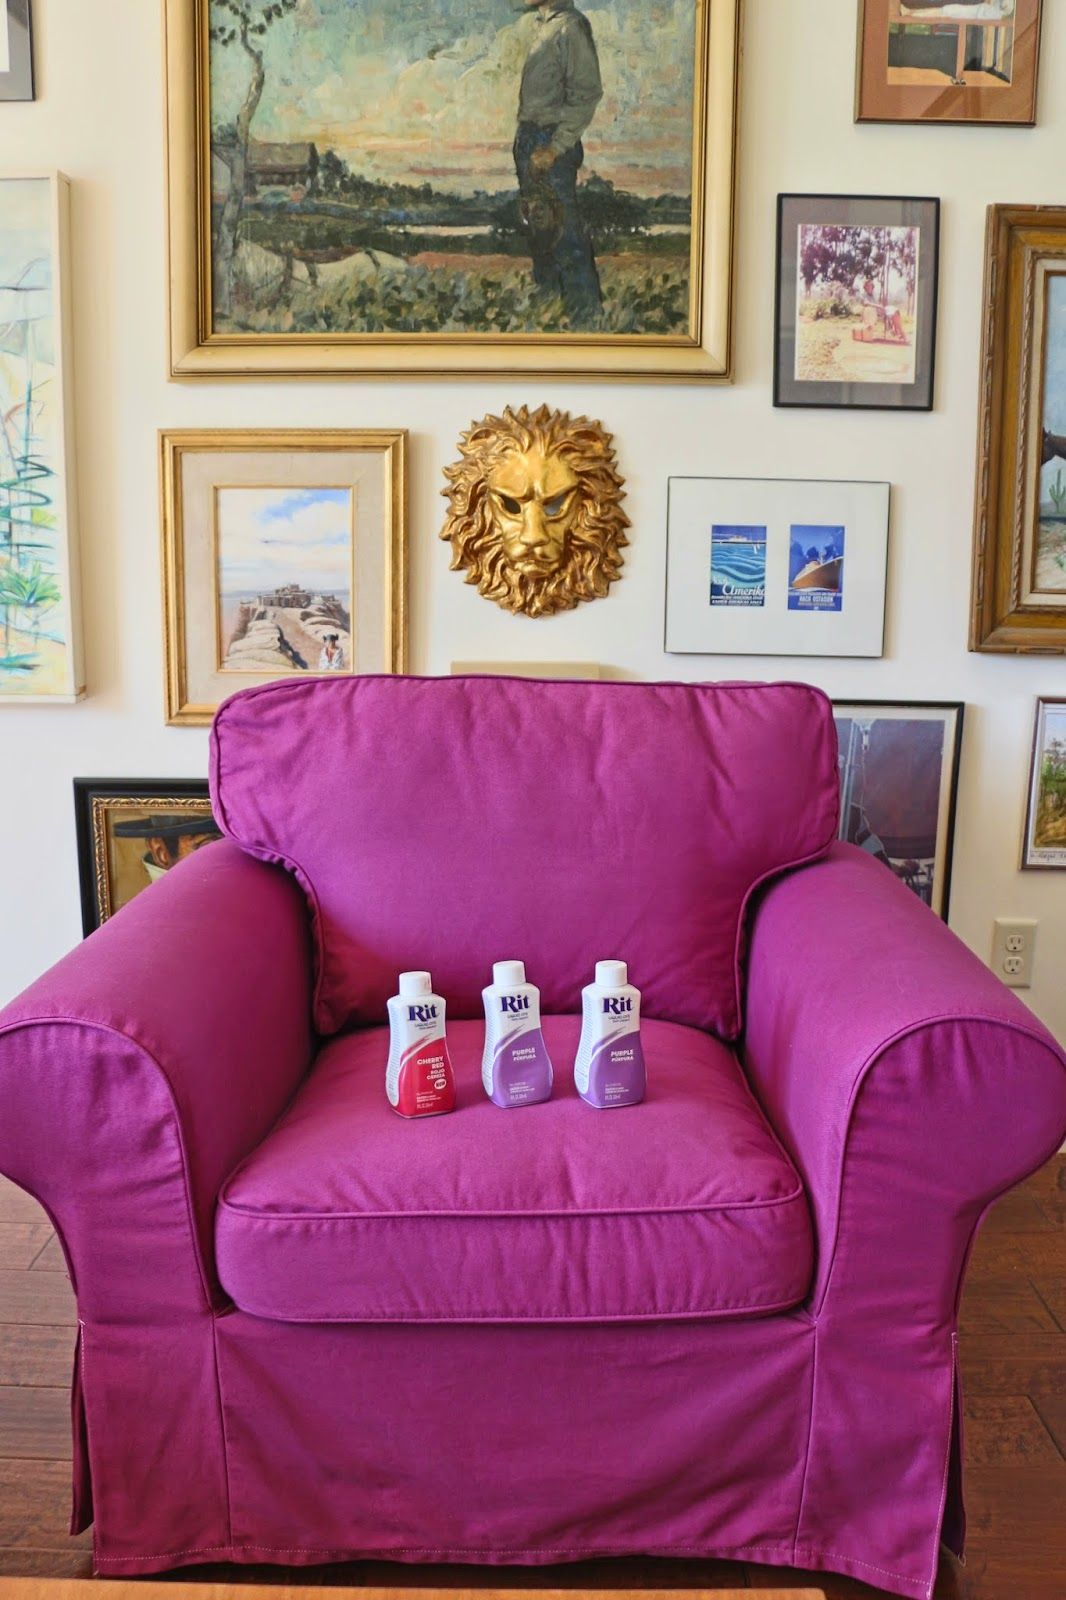 pink chair covers ikea rental columbia sc dyeing an ektorp slipcover awesome fuschia diy hack rit dye your furniture